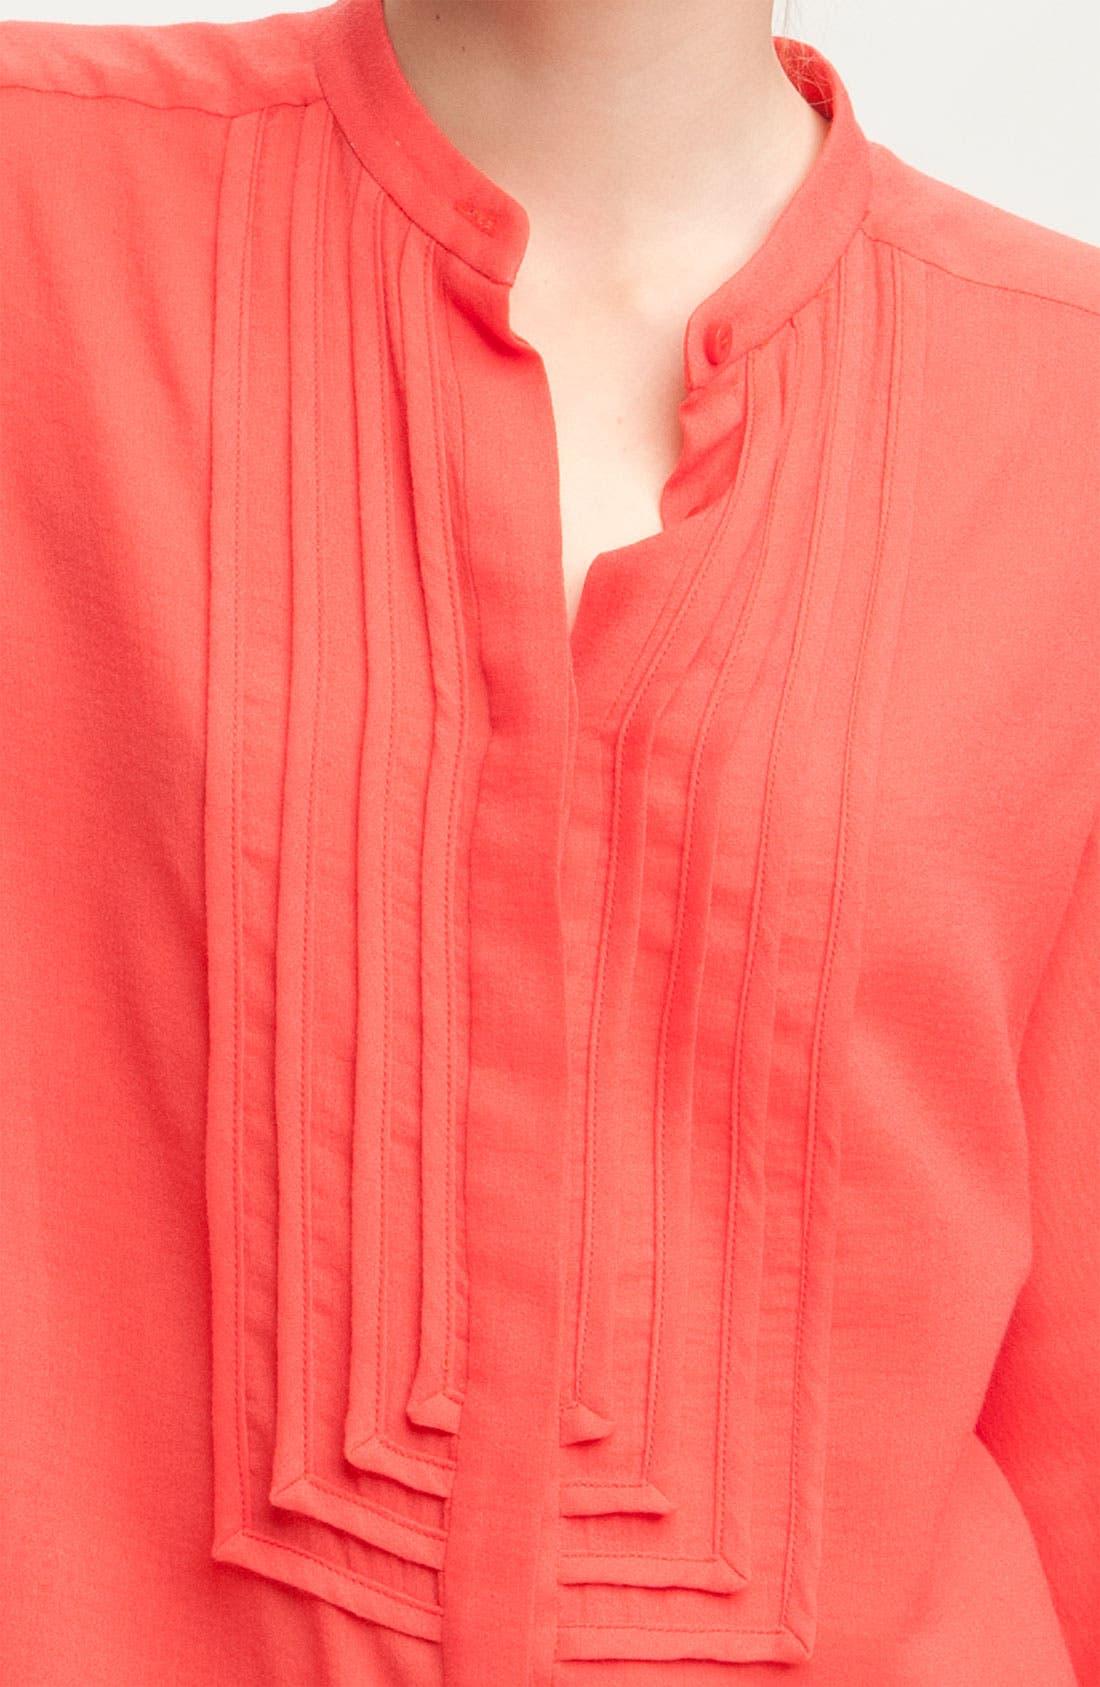 Alternate Image 3  - Diane von Furstenberg 'Hatti' Oversized Mandarin Collar Tuxedo Shirt